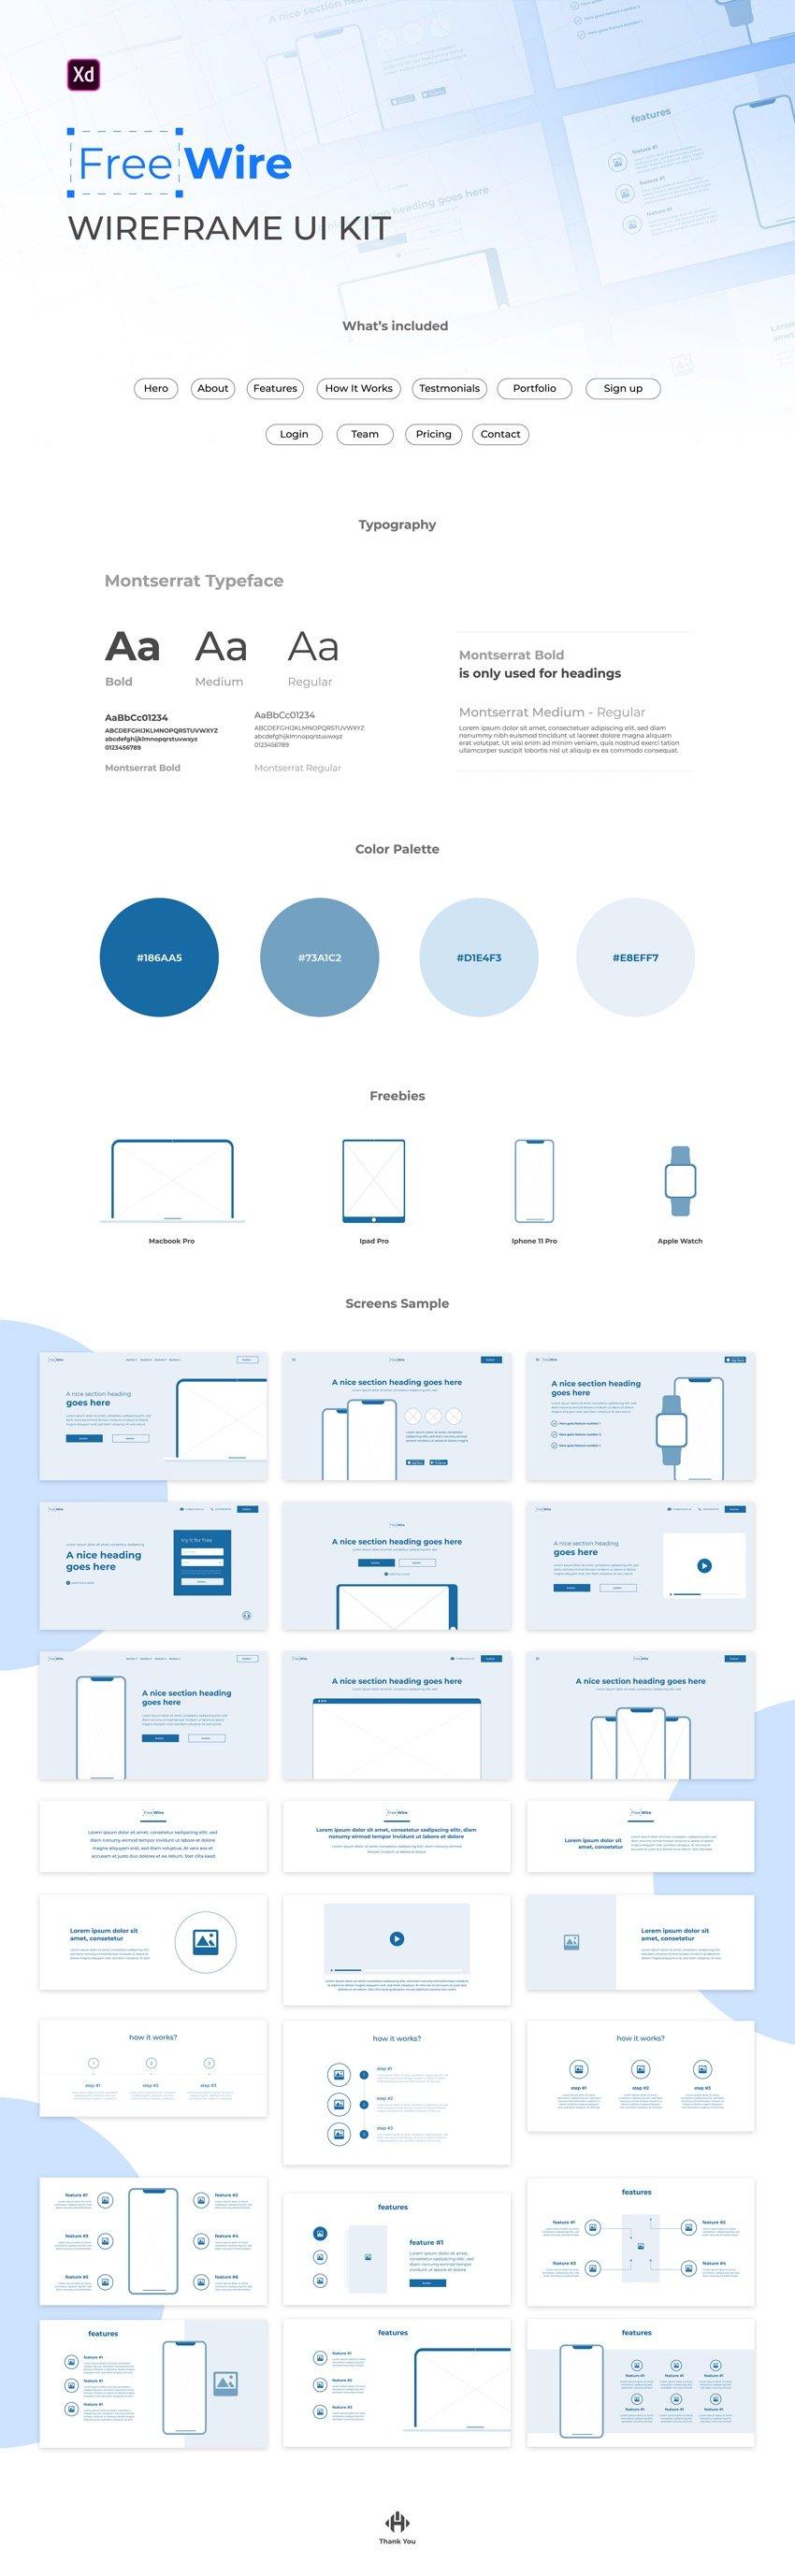 Free Wireframe UI Kit for Adobe Xd designers